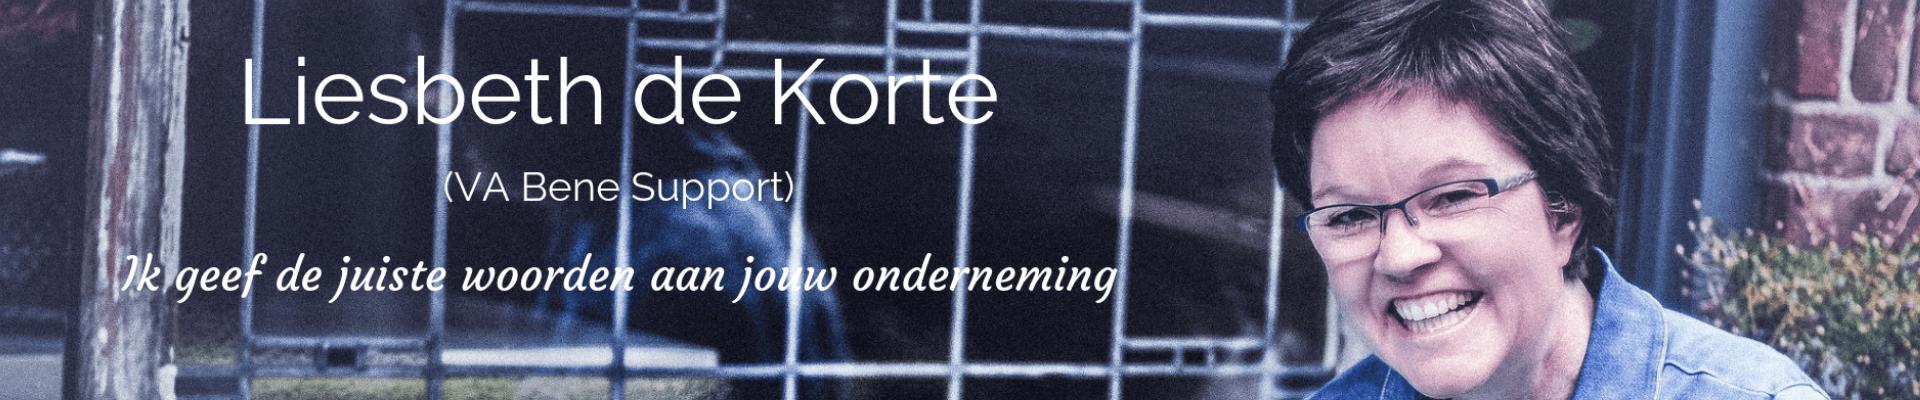 Liesbeth de Korte